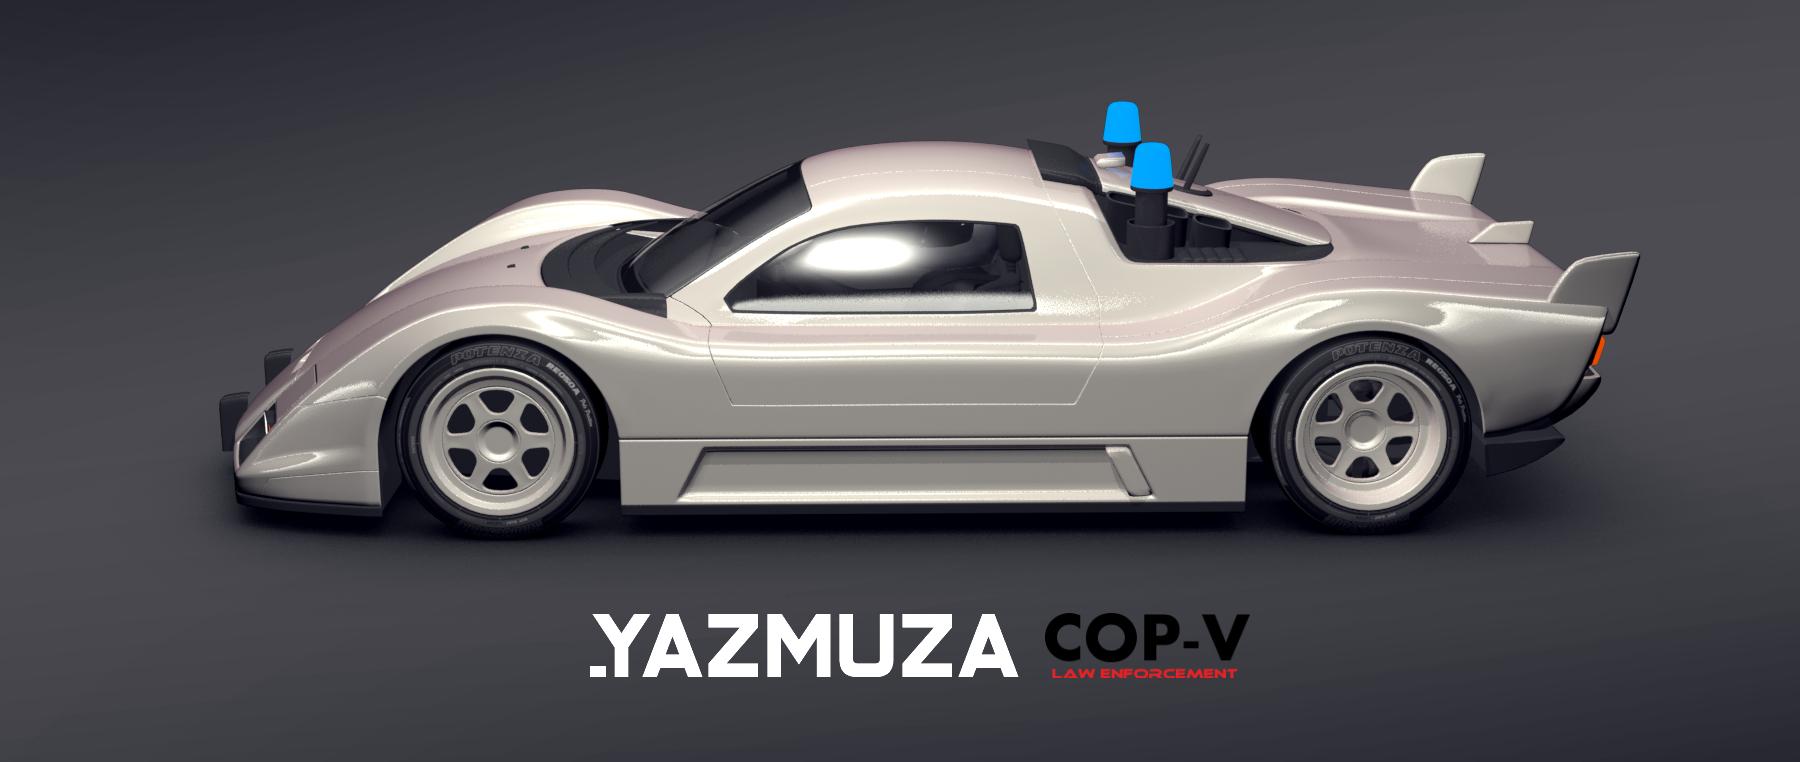 Tashita COP-V Car Render Challenge 2020